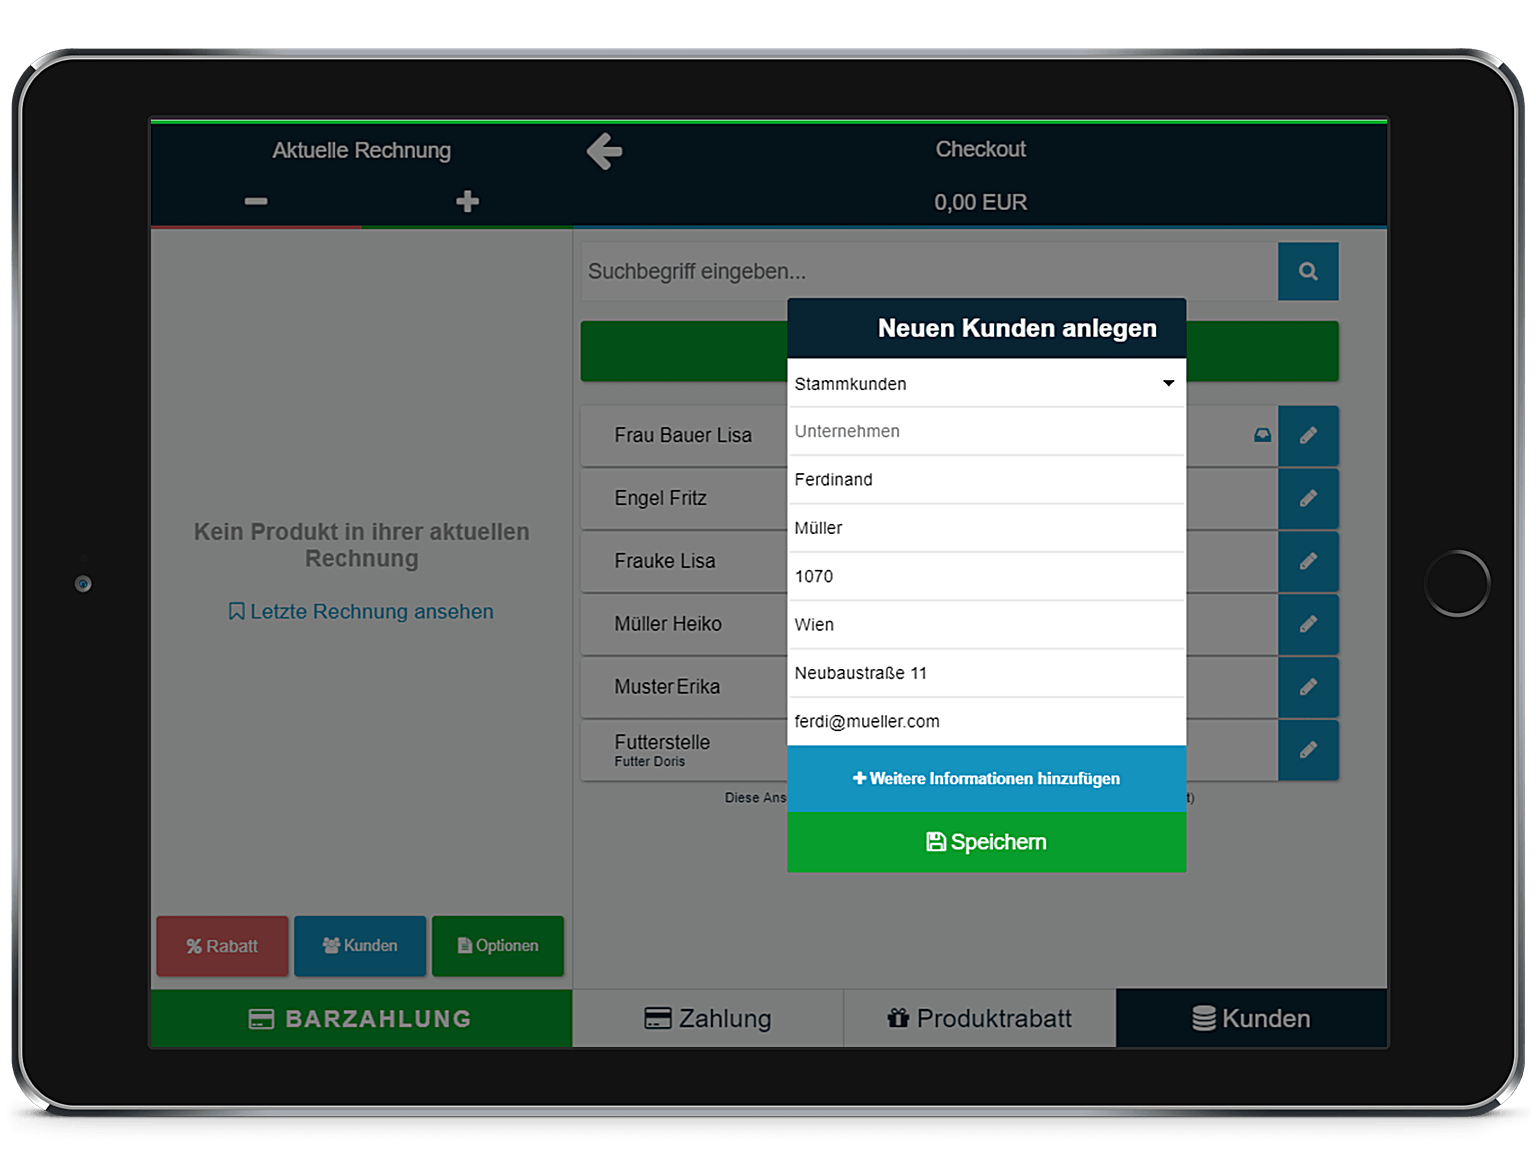 Kundendatenbank anlegen bei ready2order